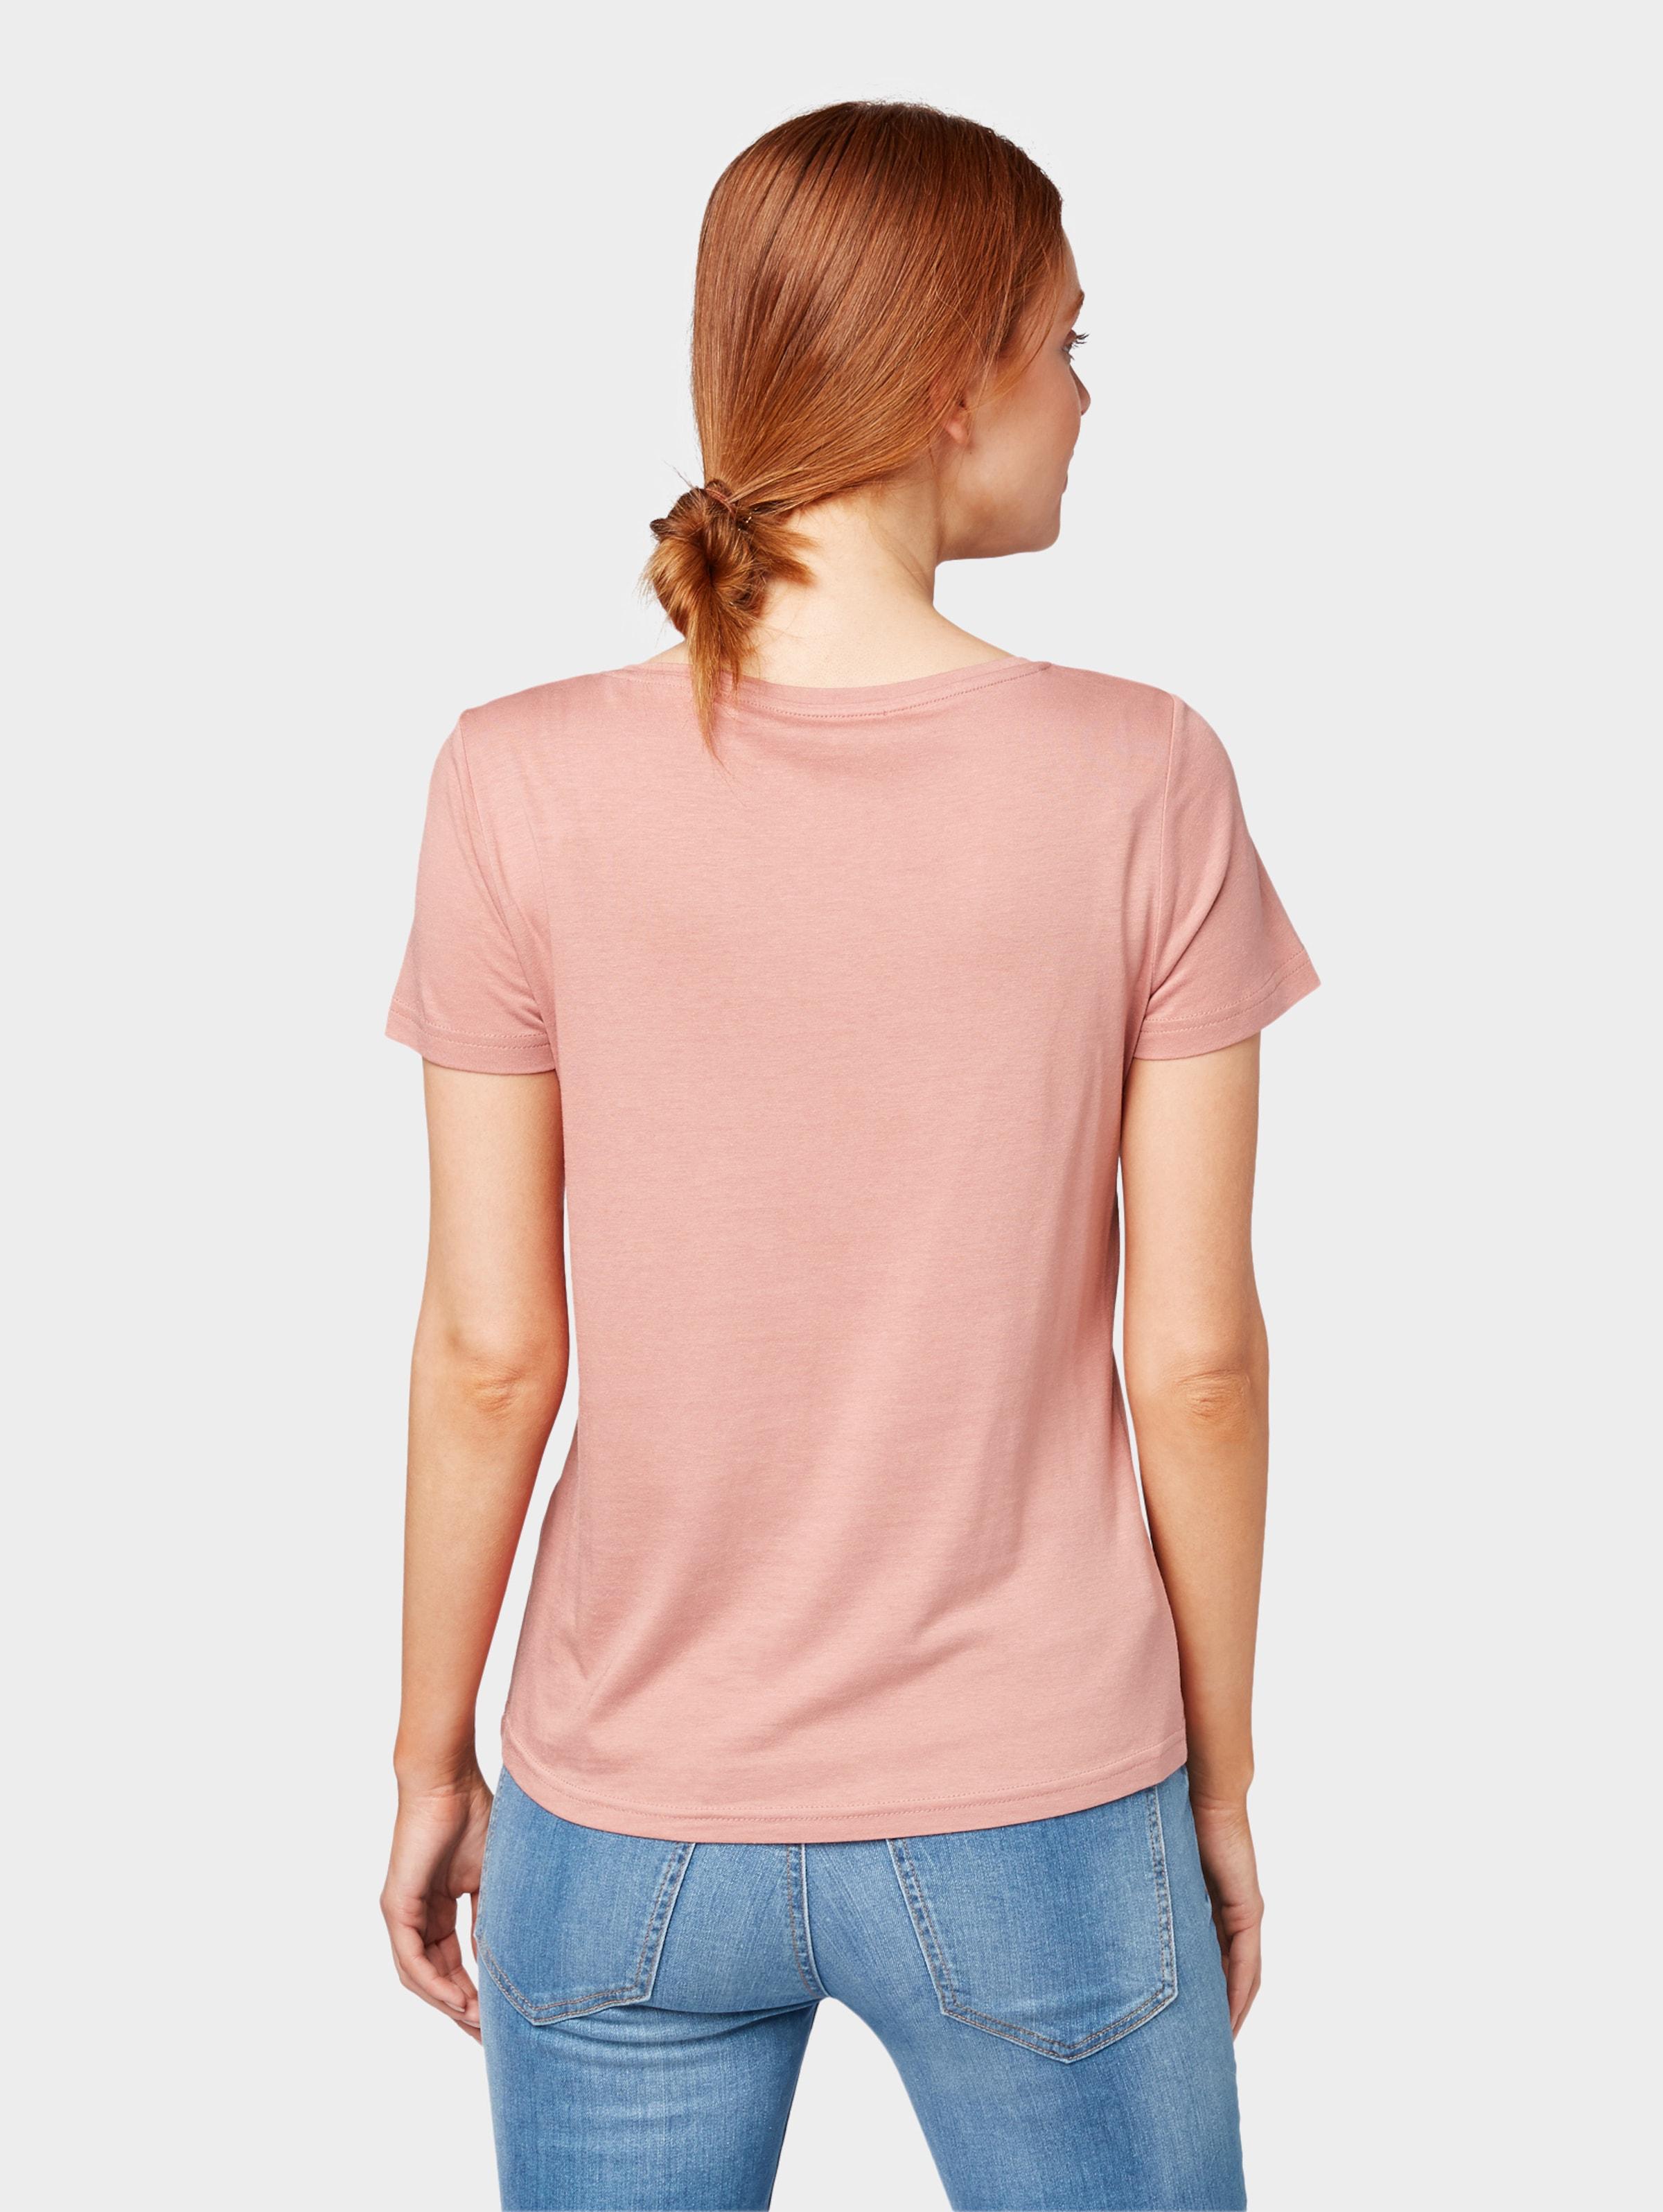 T Brusthöhe shirt Tom Tailor Auf Print Altrosa Mit In kiXTwOPZu